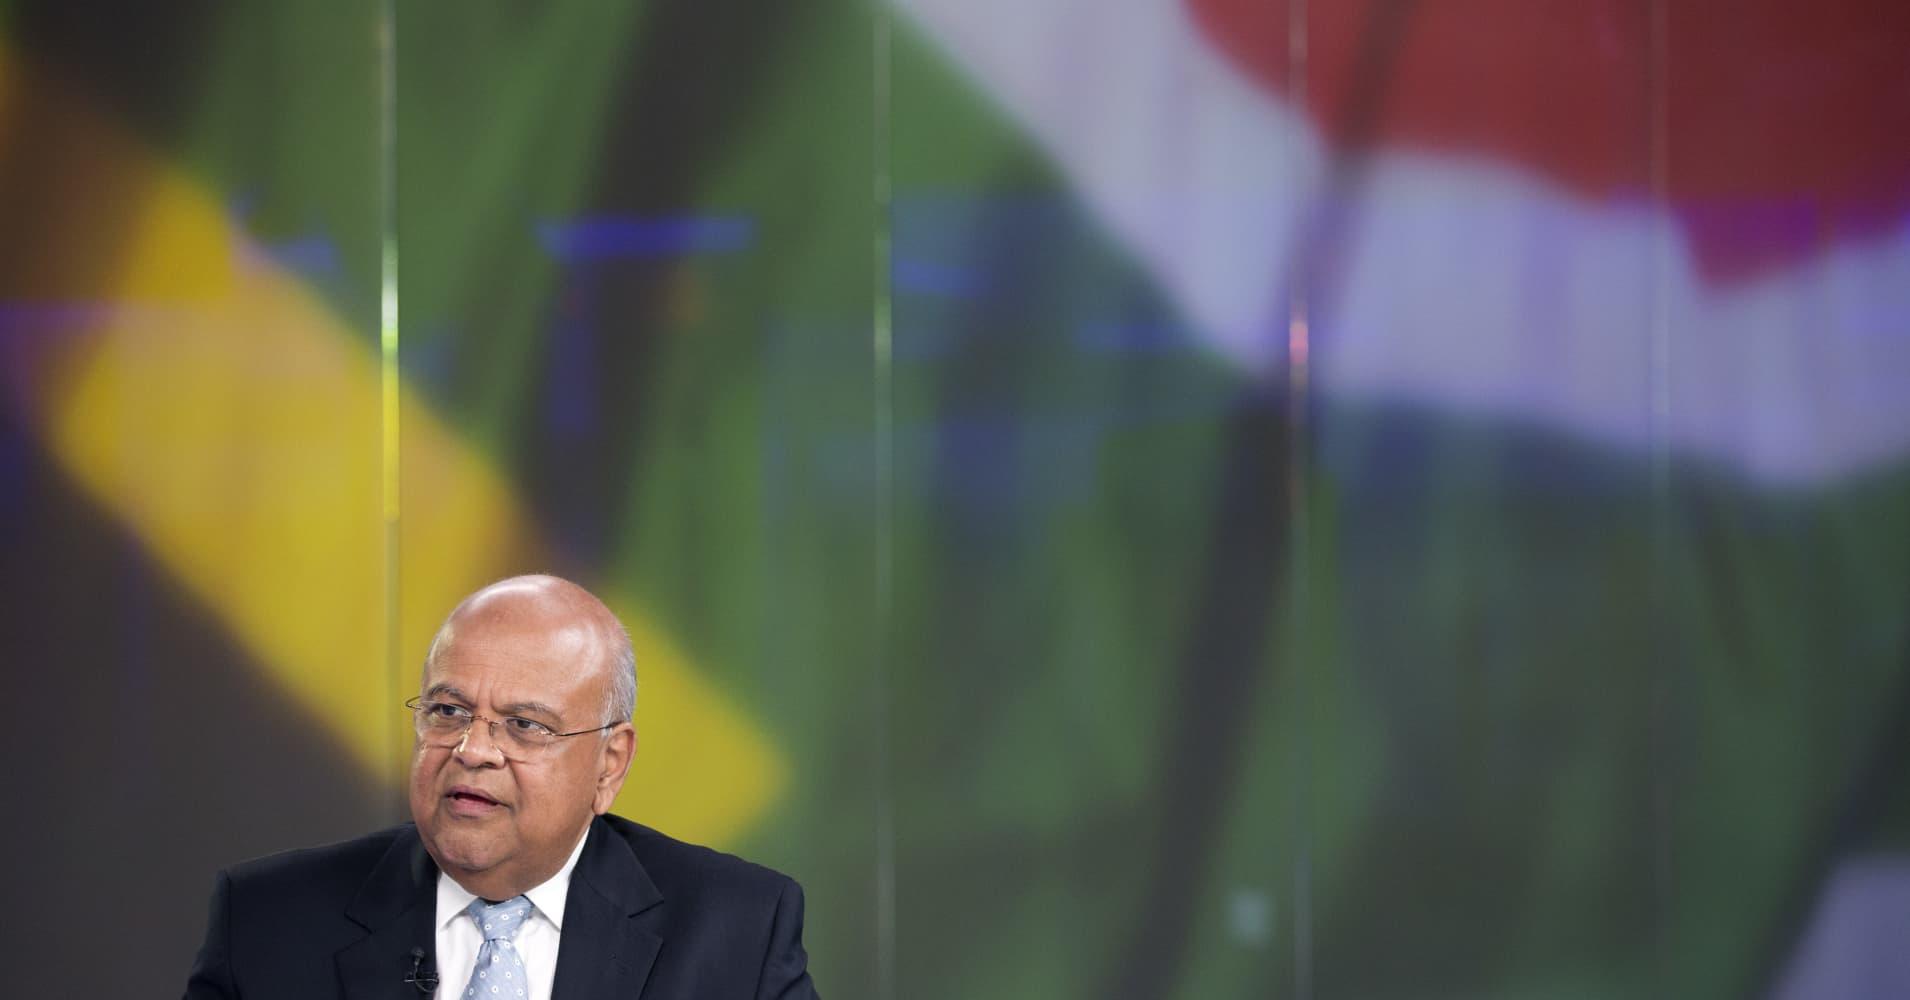 South African Finance Minister Pravin Gordhan